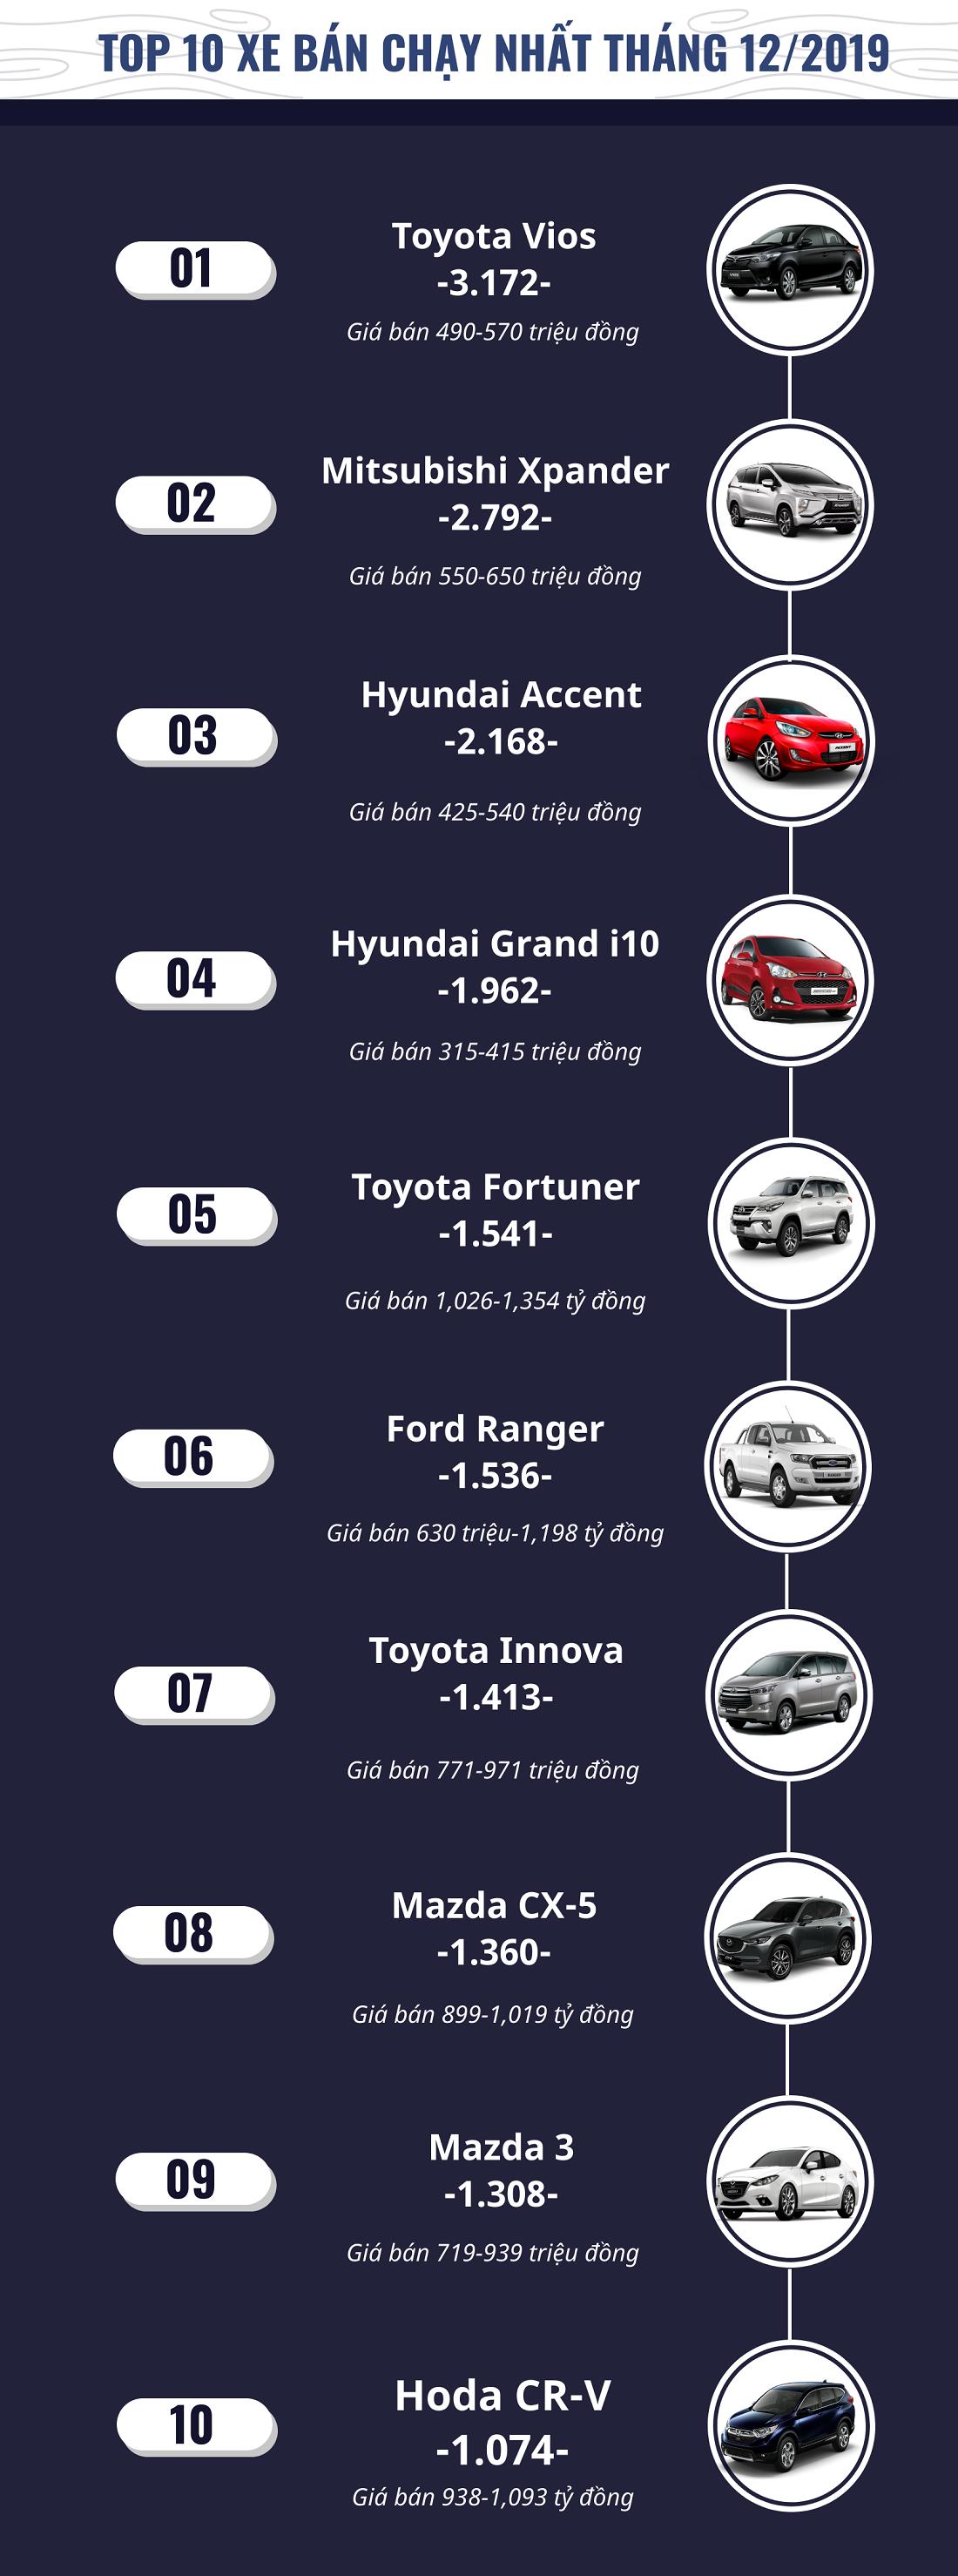 infographic top 10 xe ban chay nhat thang 122019 toyota vios tro lai ngoi vuong